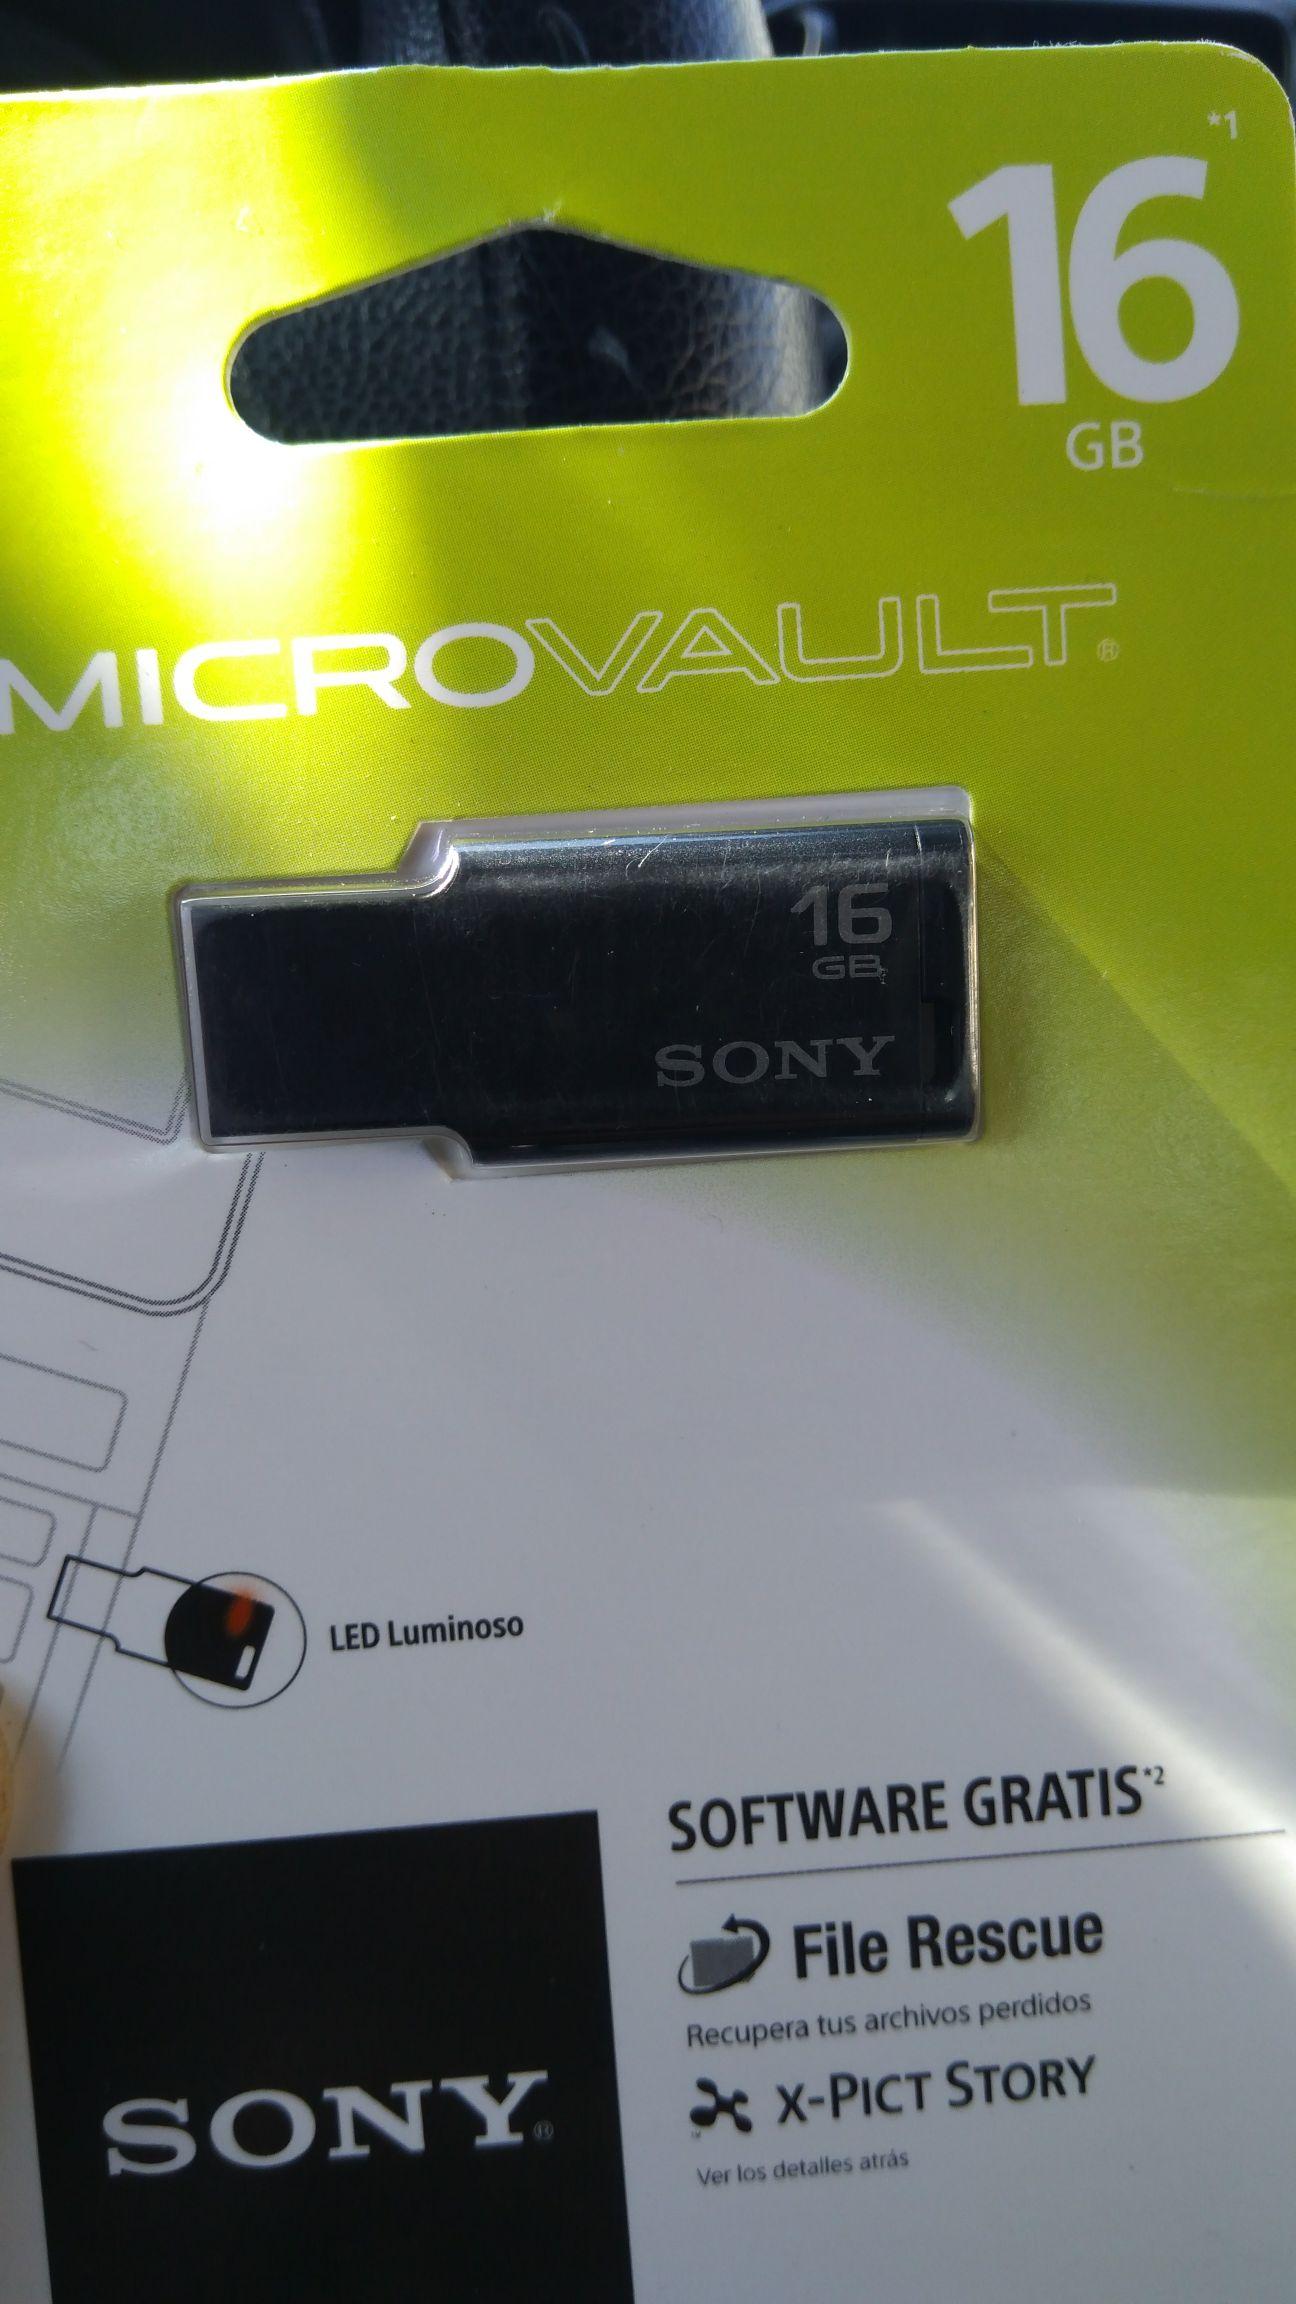 Bodega Aurrerá: Memoria USB 2.0 16 Gb $139.02